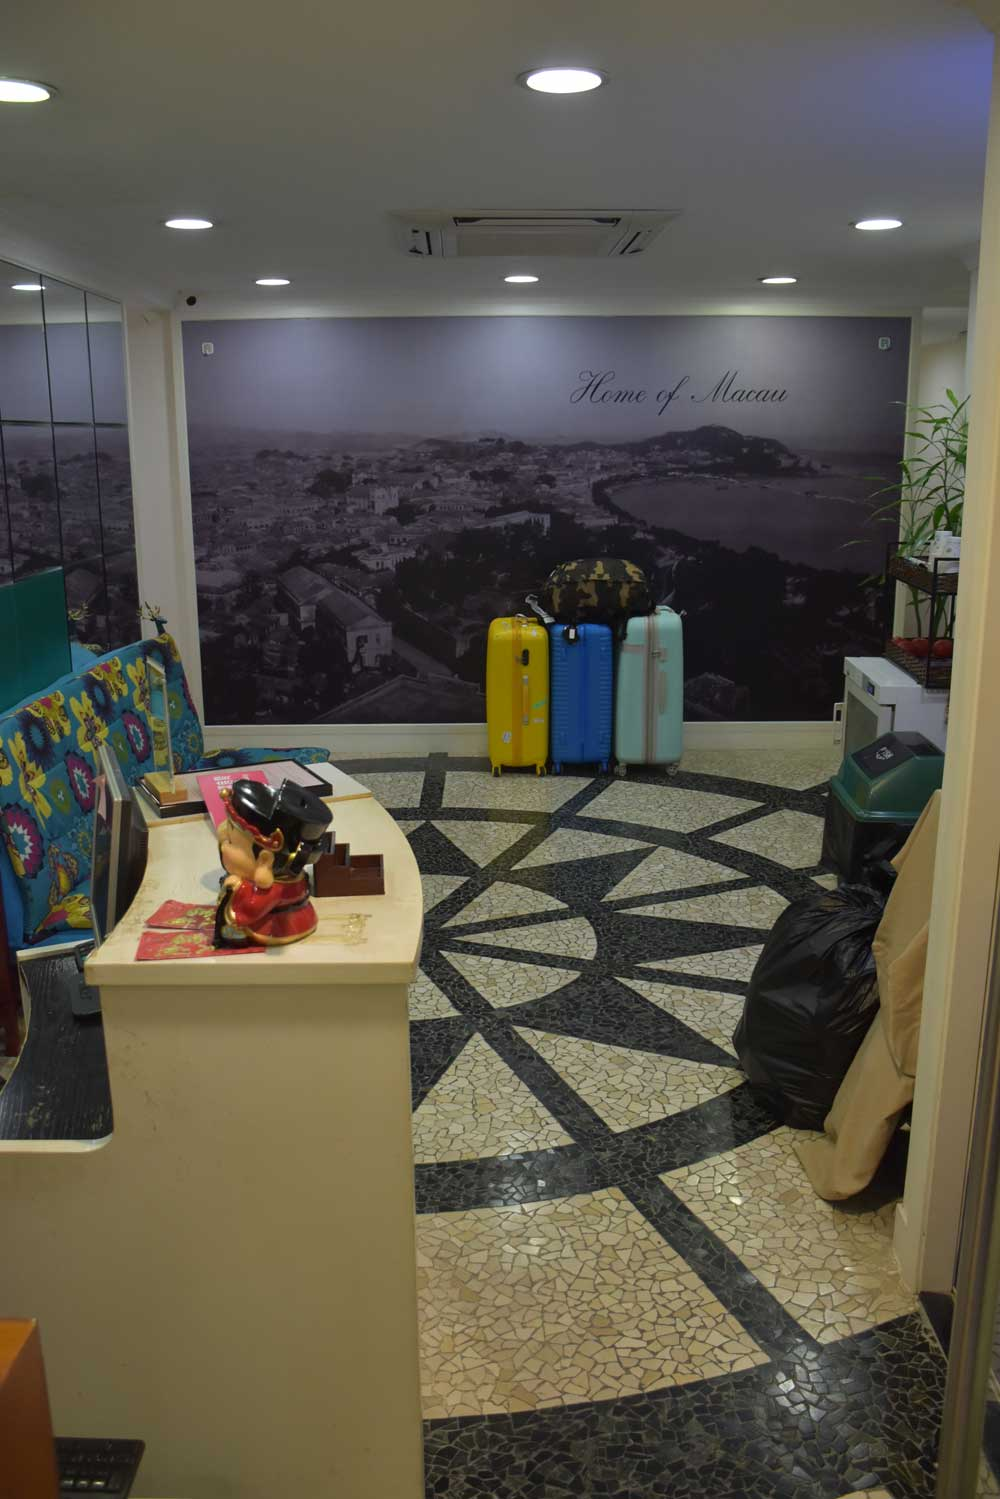 Macau Home Hotel lobby